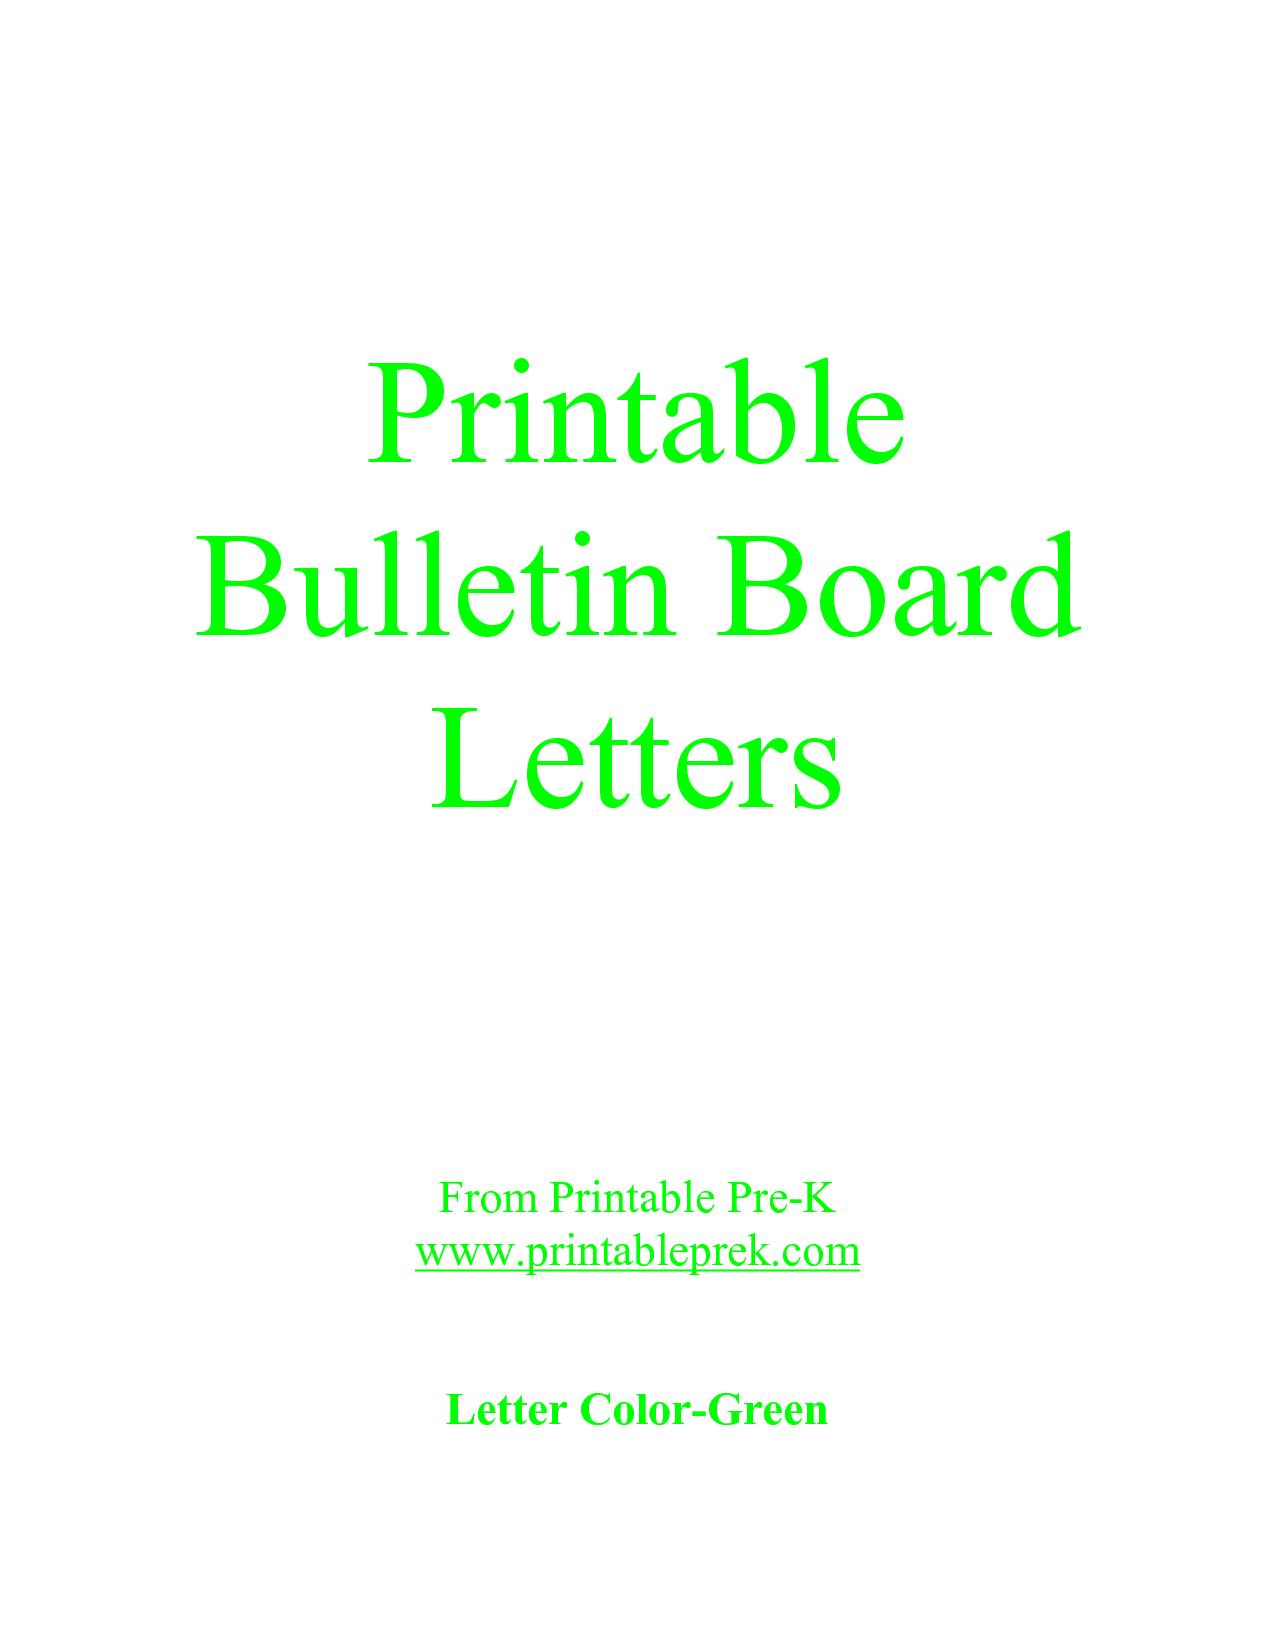 Free Printable Letter Templates For Bulletin Boards   Template To - Free Printable Bulletin Board Letters